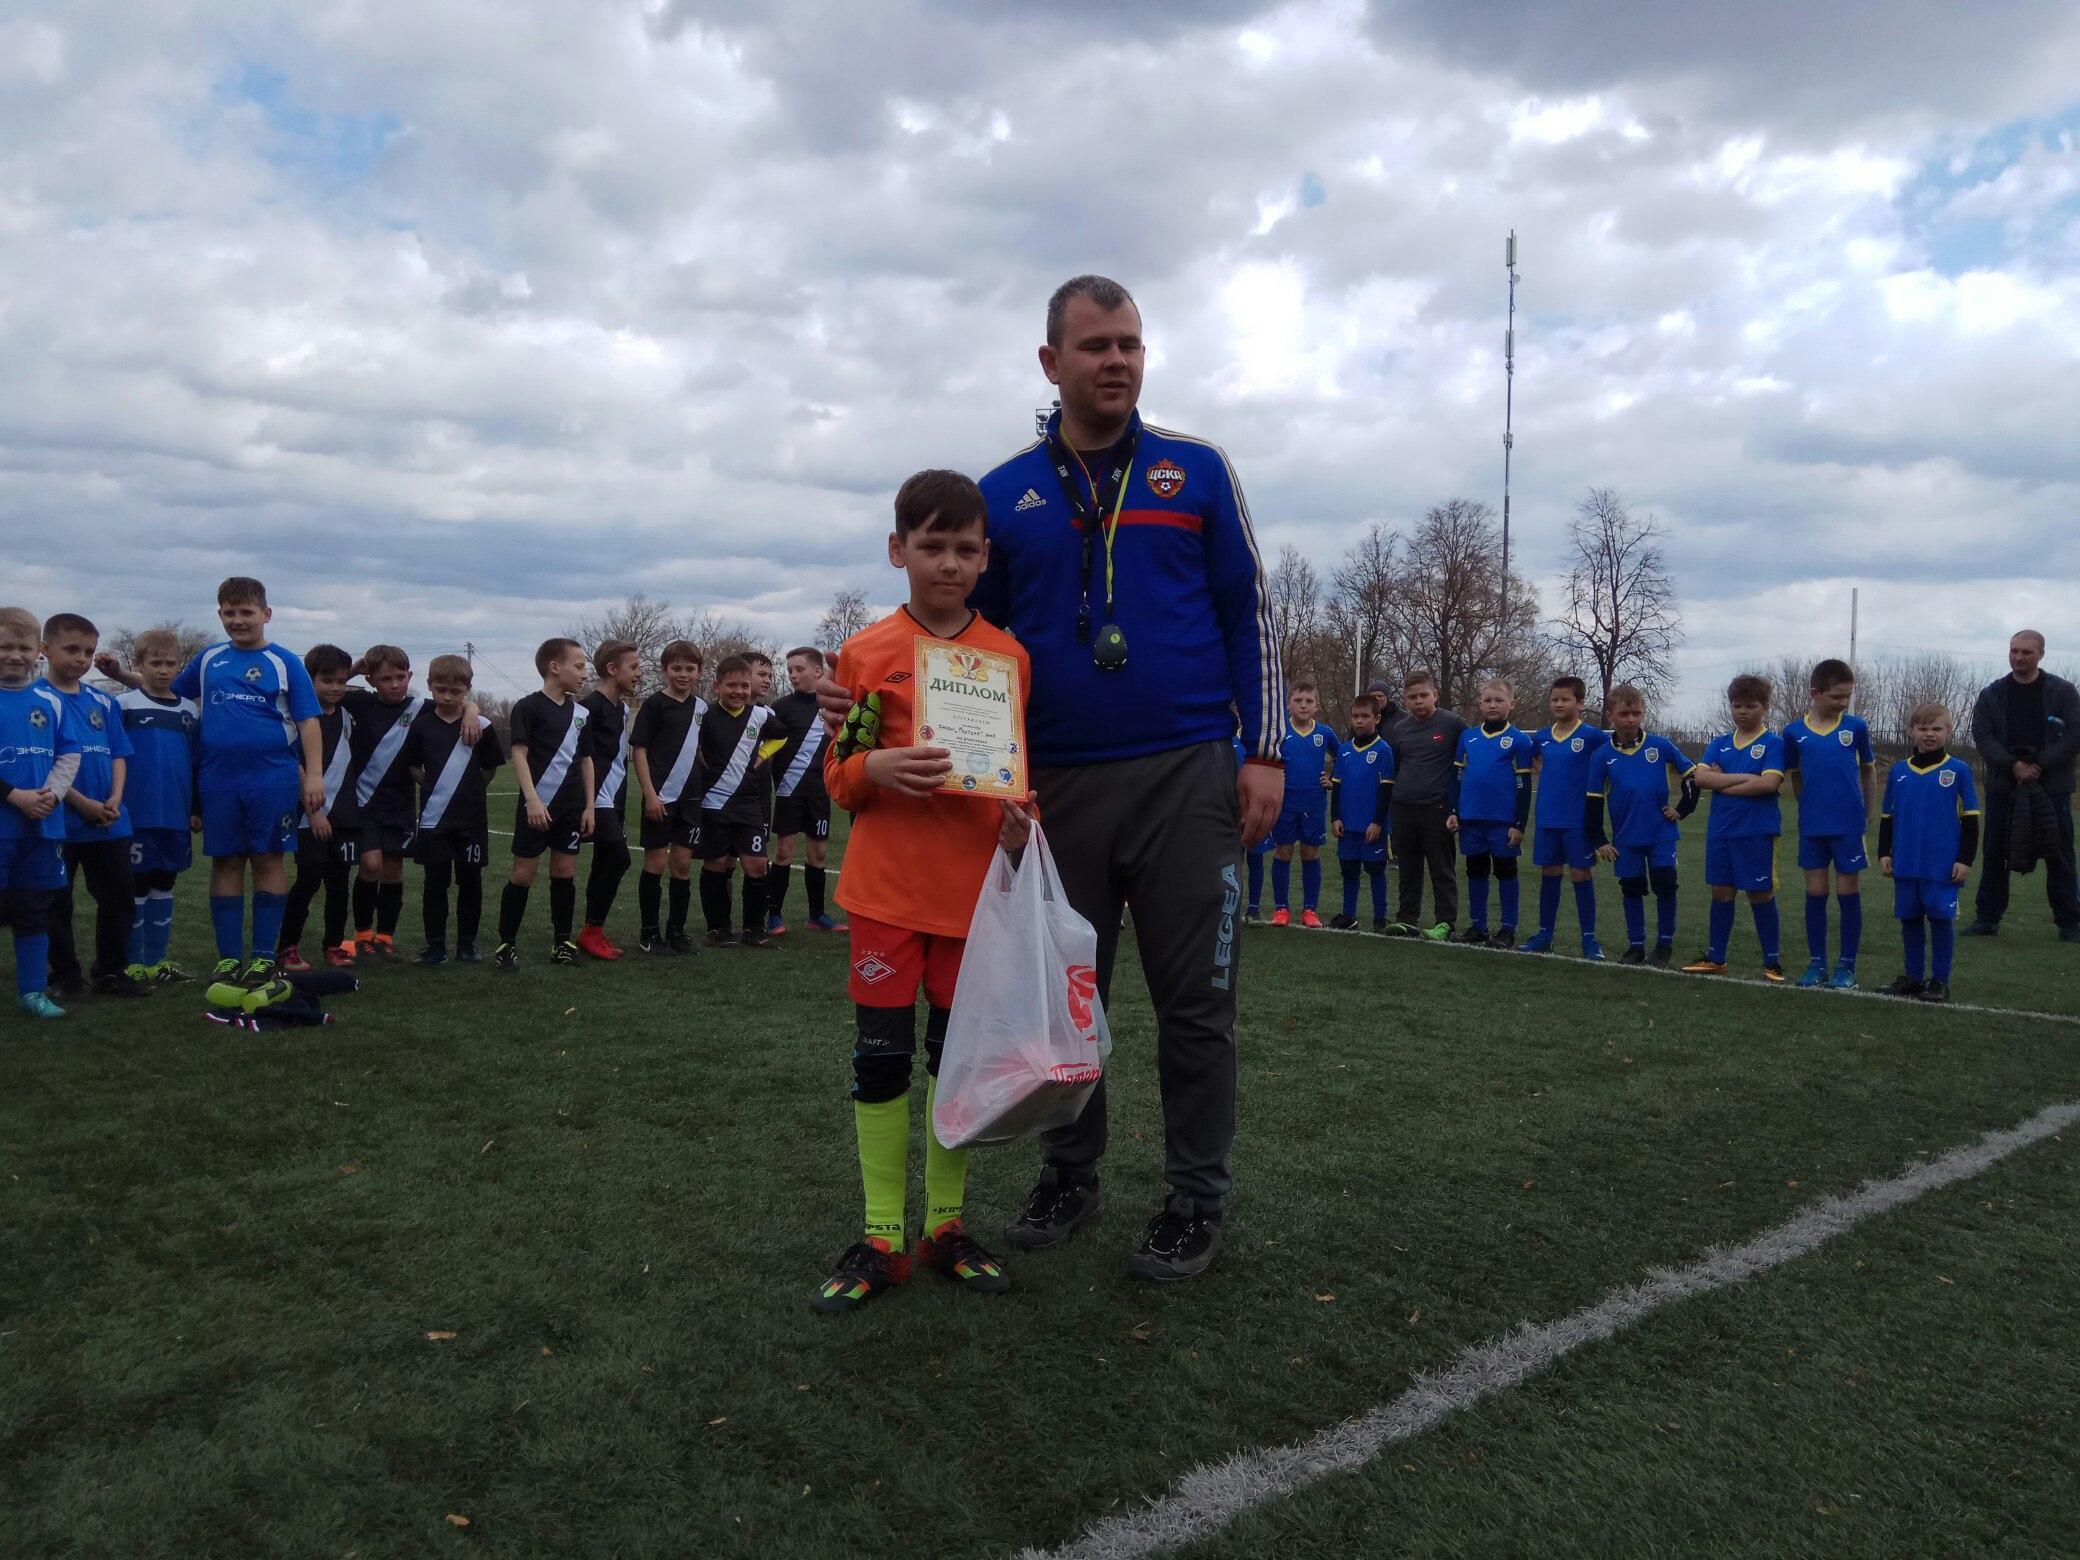 Итоги турнира по футболу среди детских команд